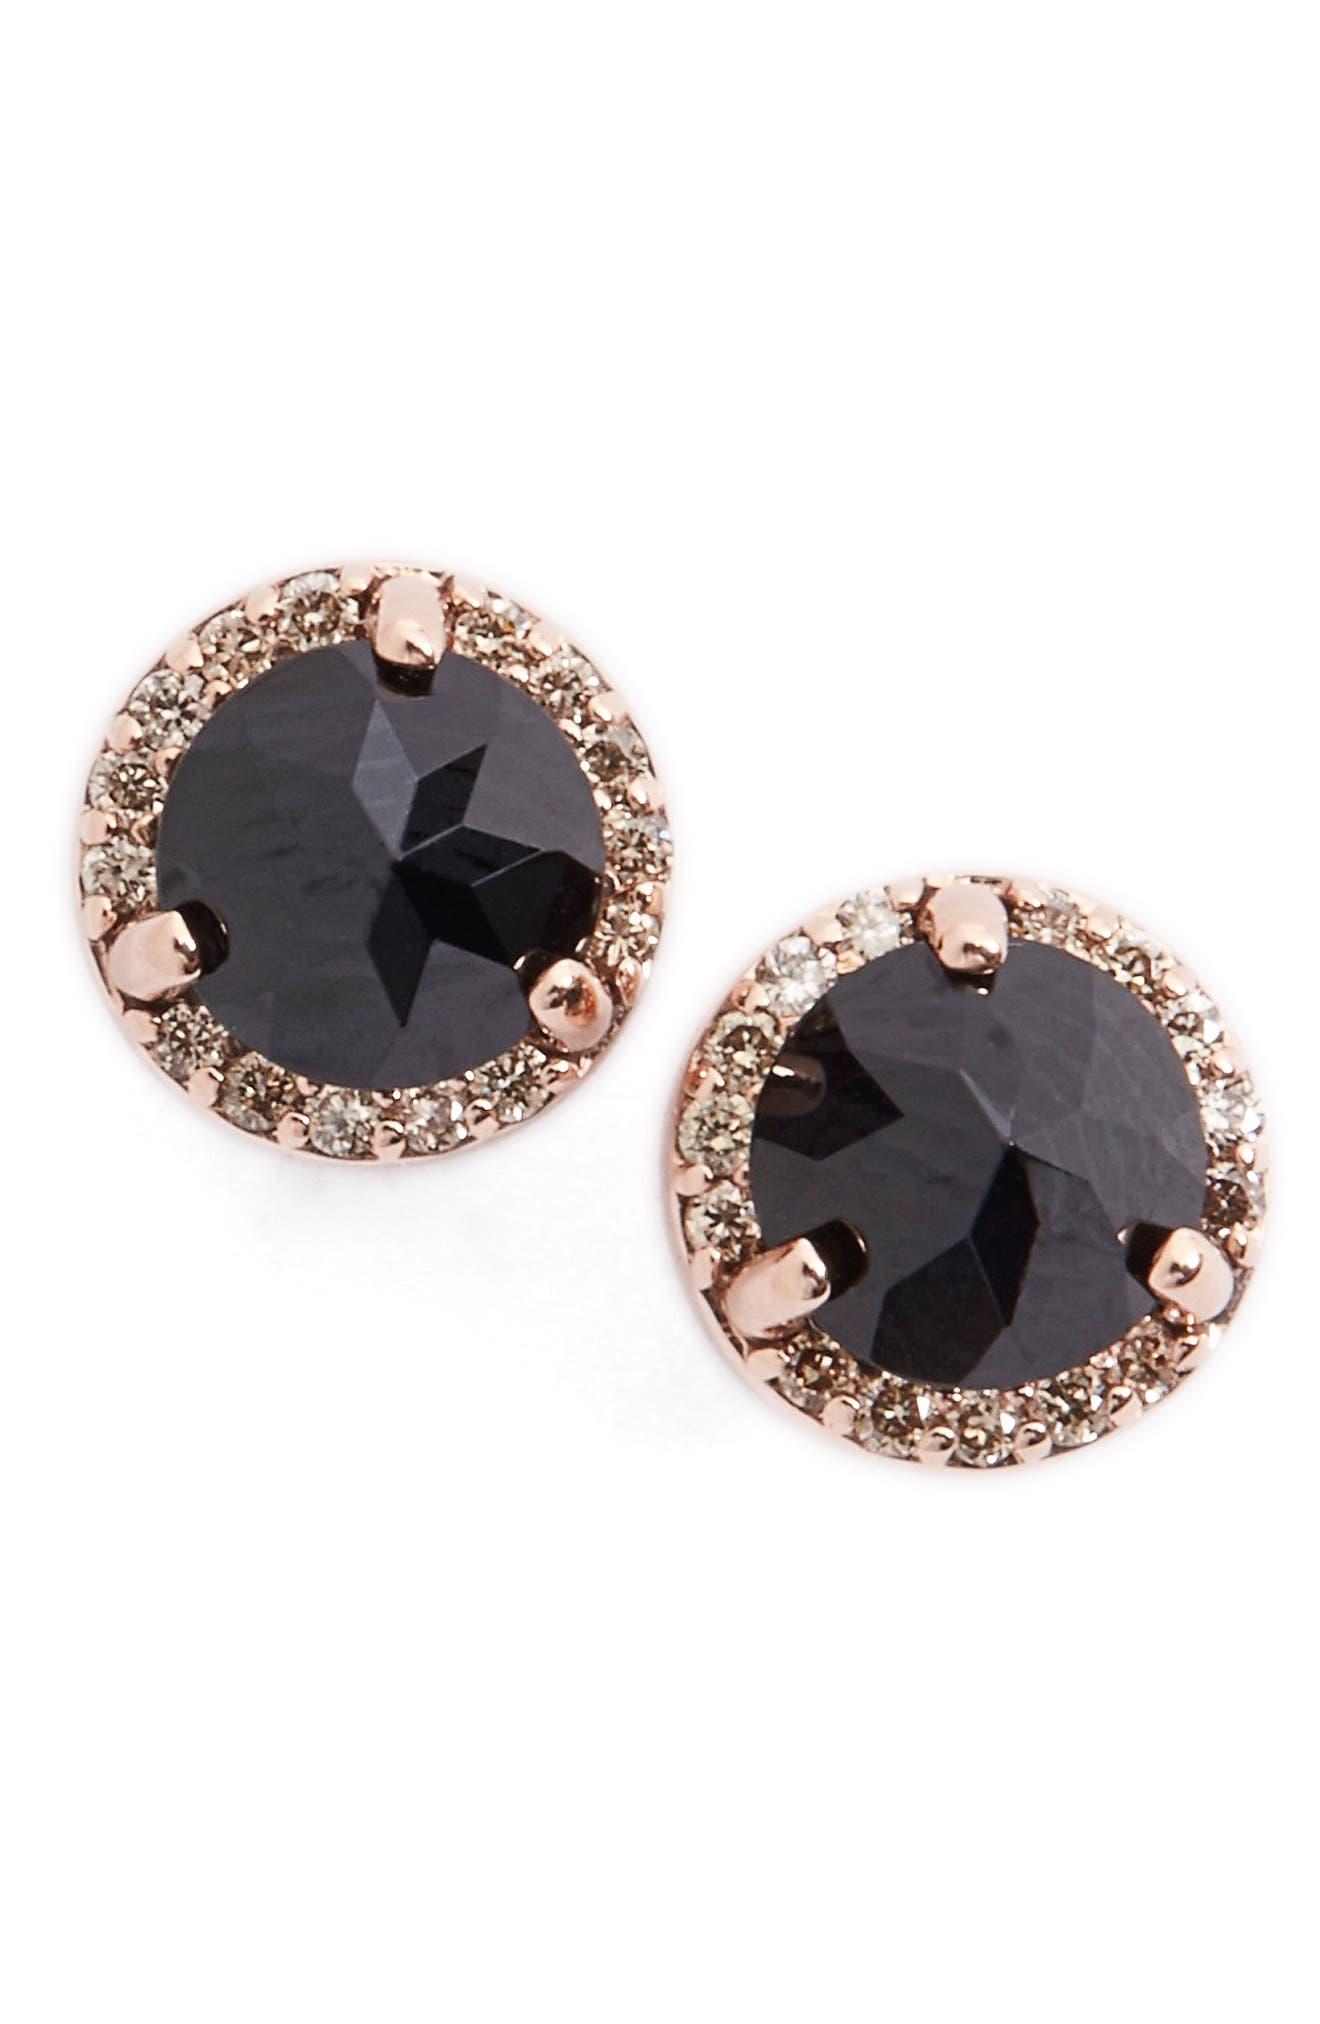 Main Image - Anna Sheffield Black Spinel& ChampagneDiamond Rosette Stud Earrings